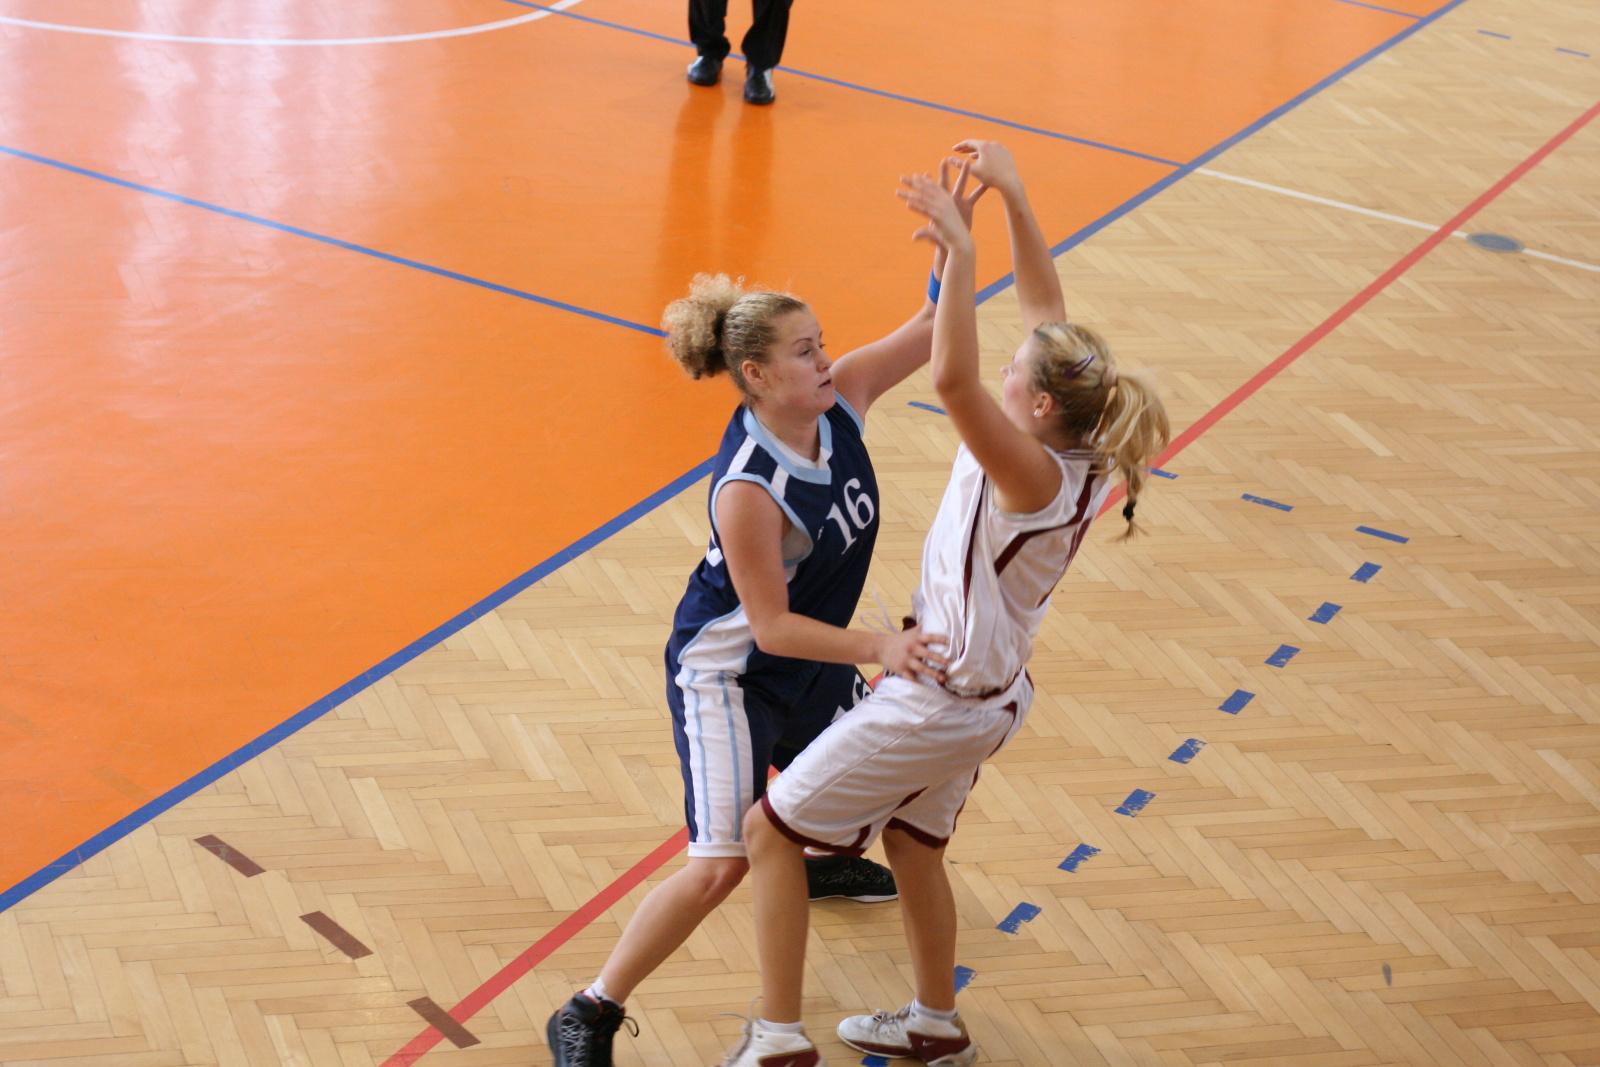 bk-zs-zvolen-bk-petrzalka-basketbal-juniorky-18